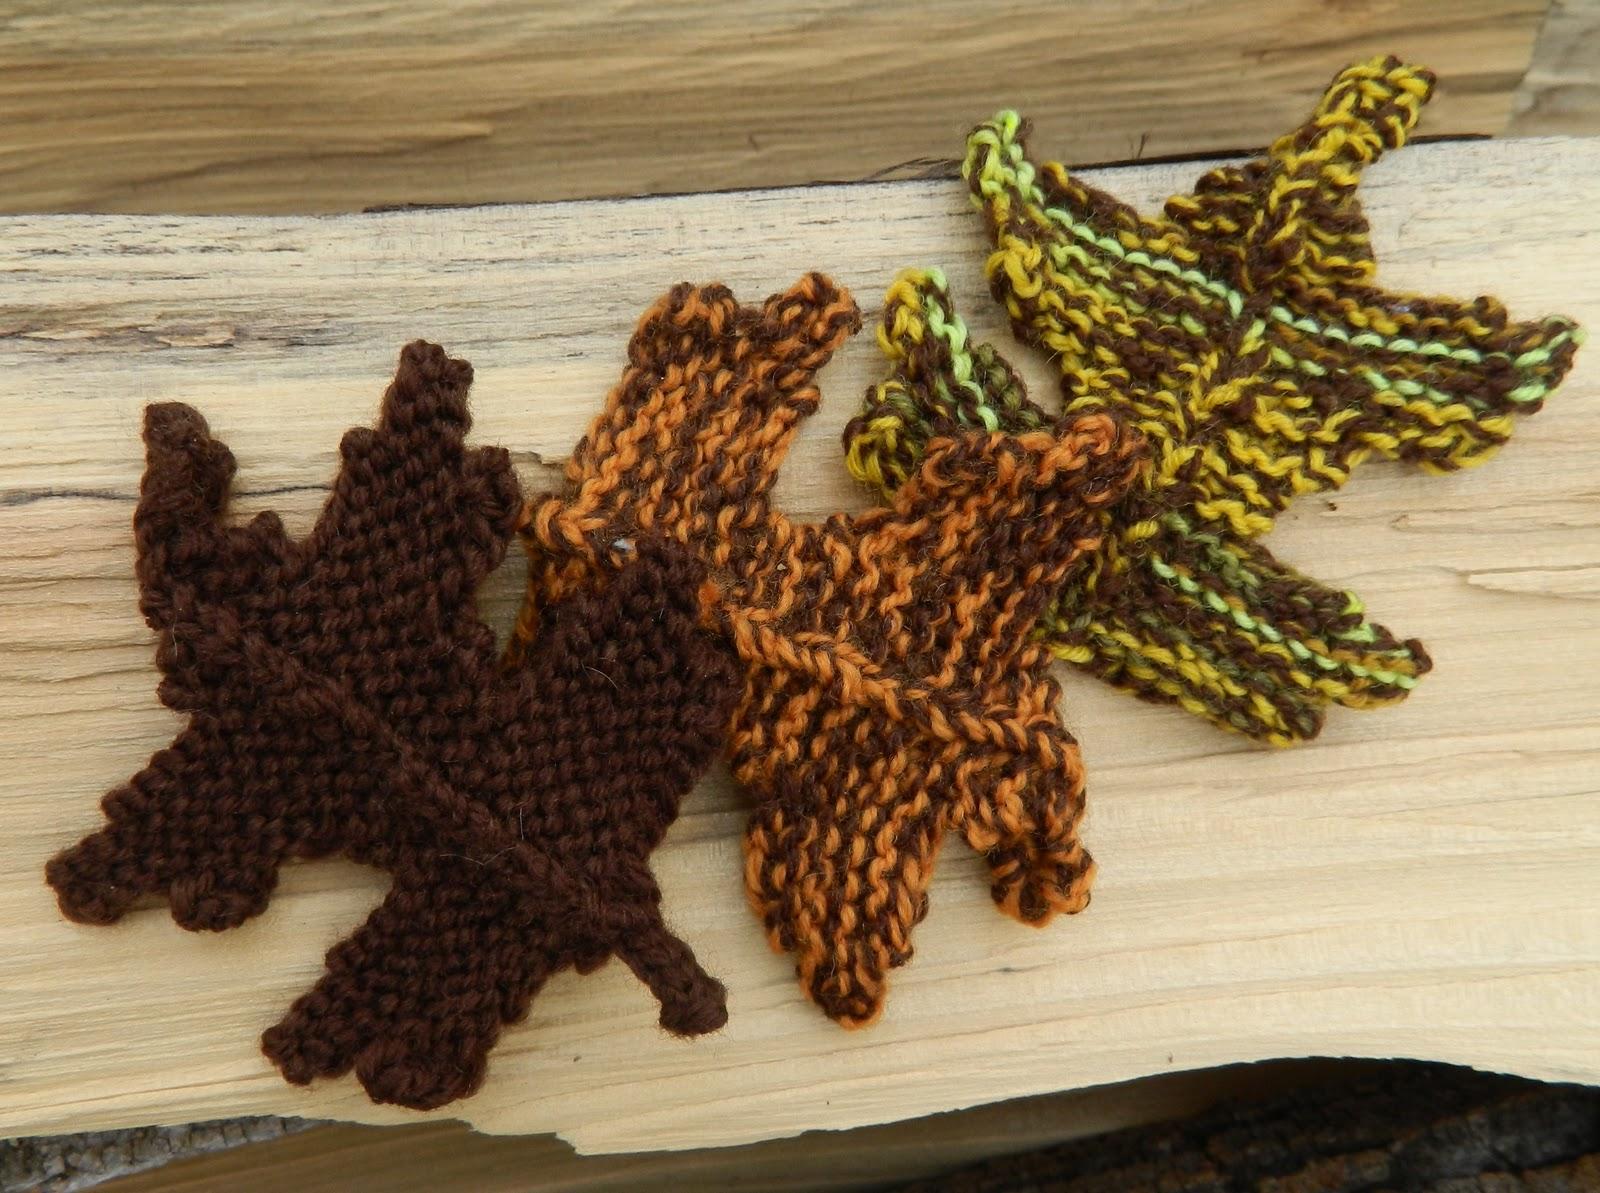 Falling Leaves Knitting Pattern : The Handmade Homemaker: Craft Fall leaves Knitting Pattern